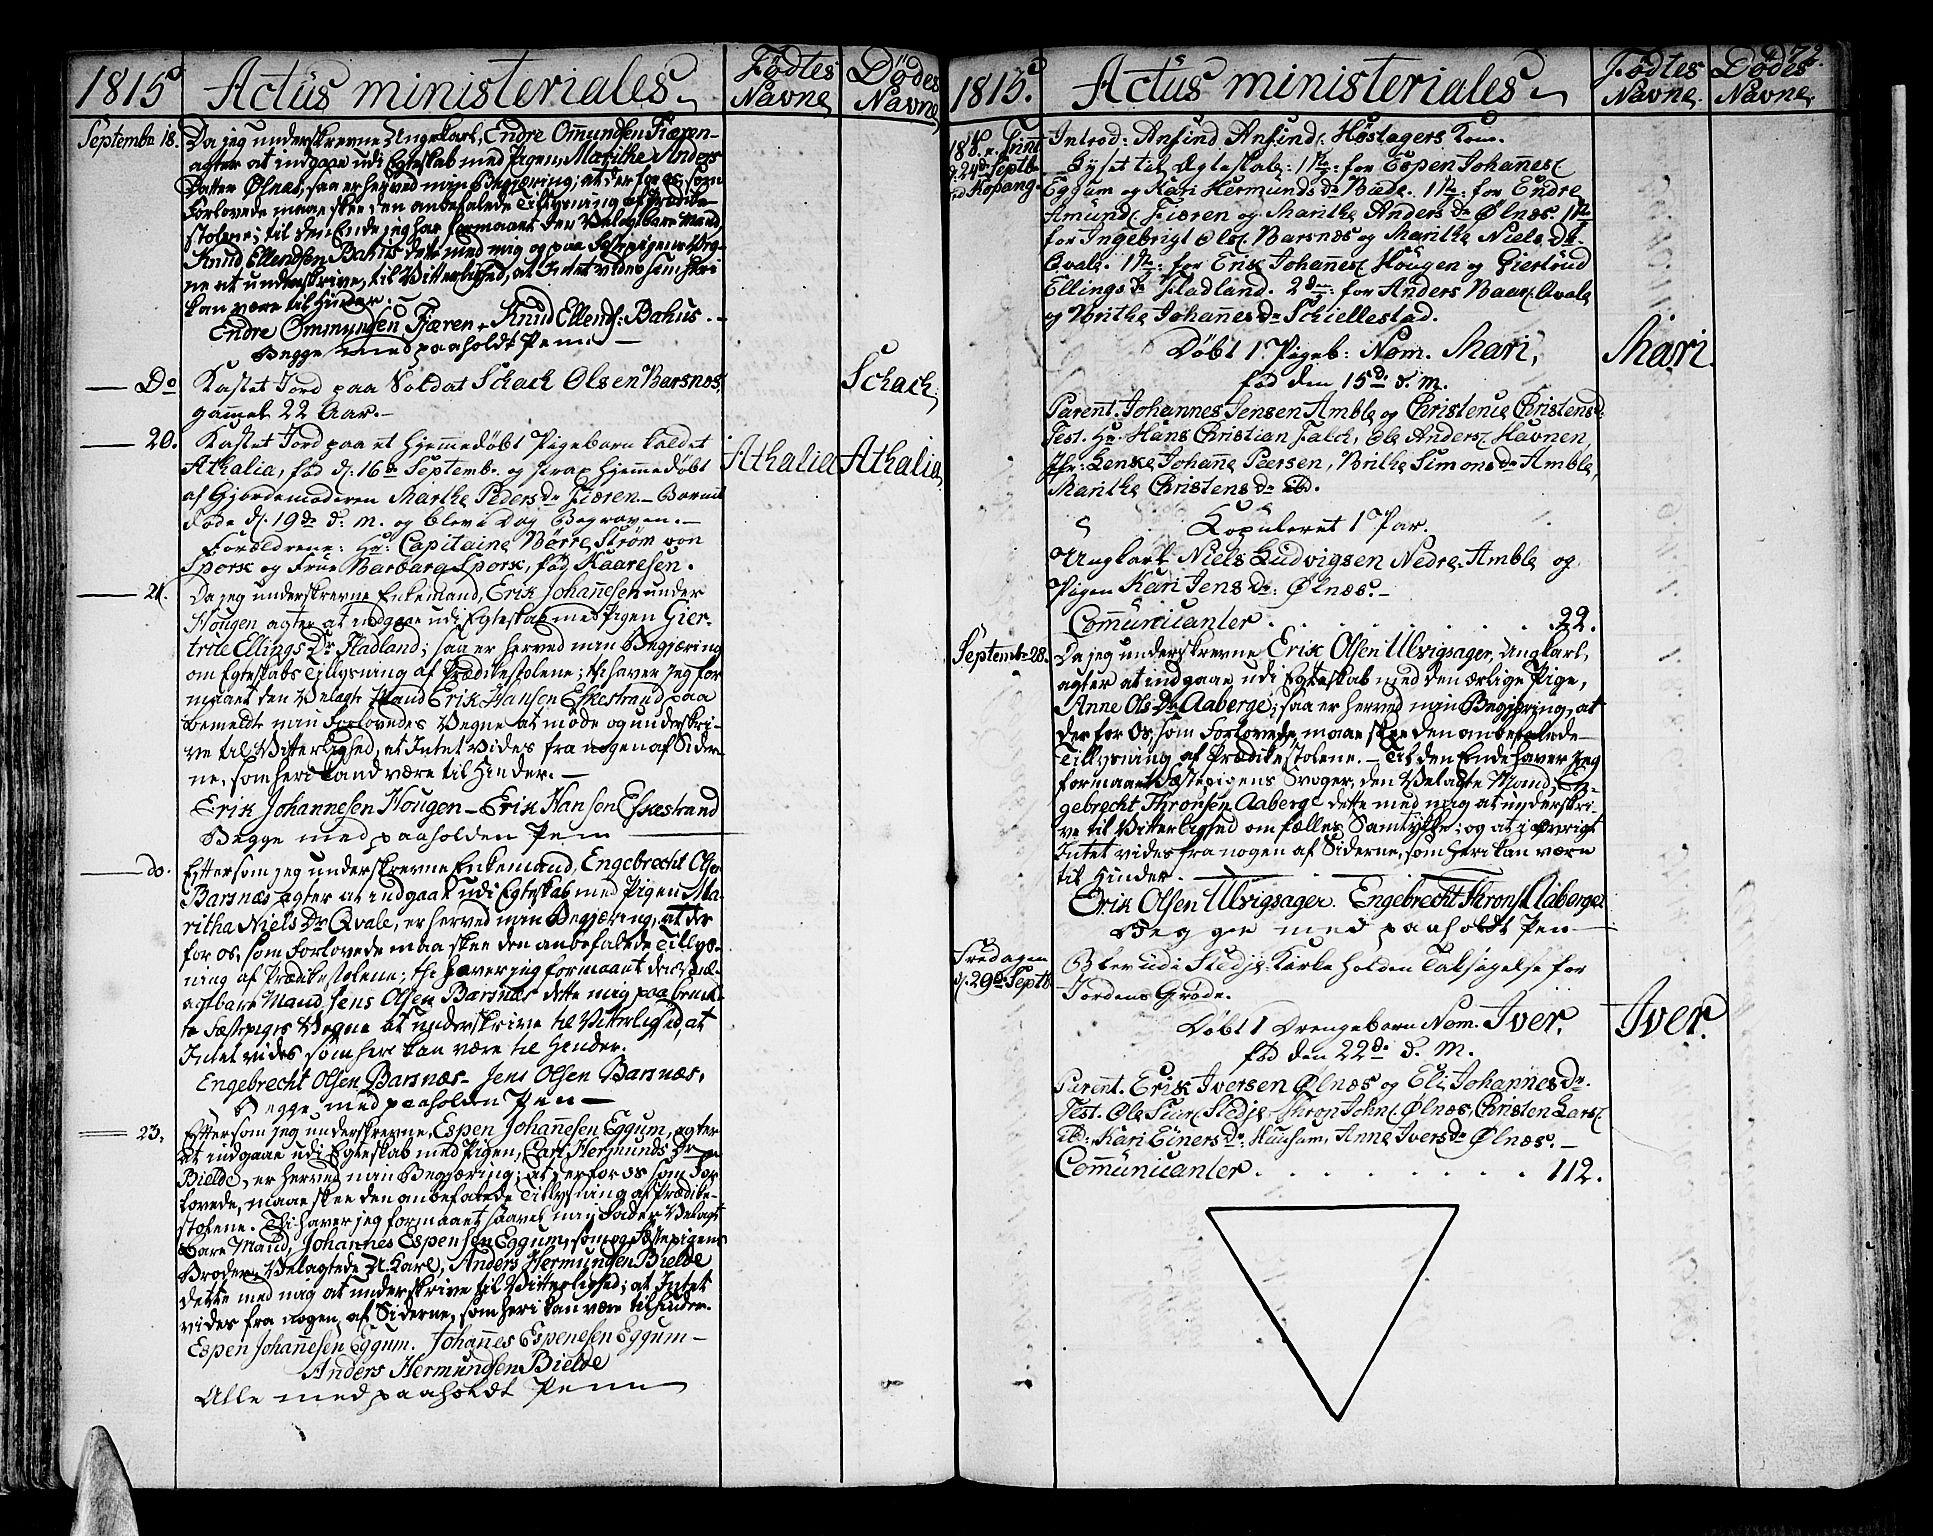 SAB, Sogndal sokneprestembete, H/Haa/Haaa/L0009: Parish register (official) no. A 9, 1809-1821, p. 72